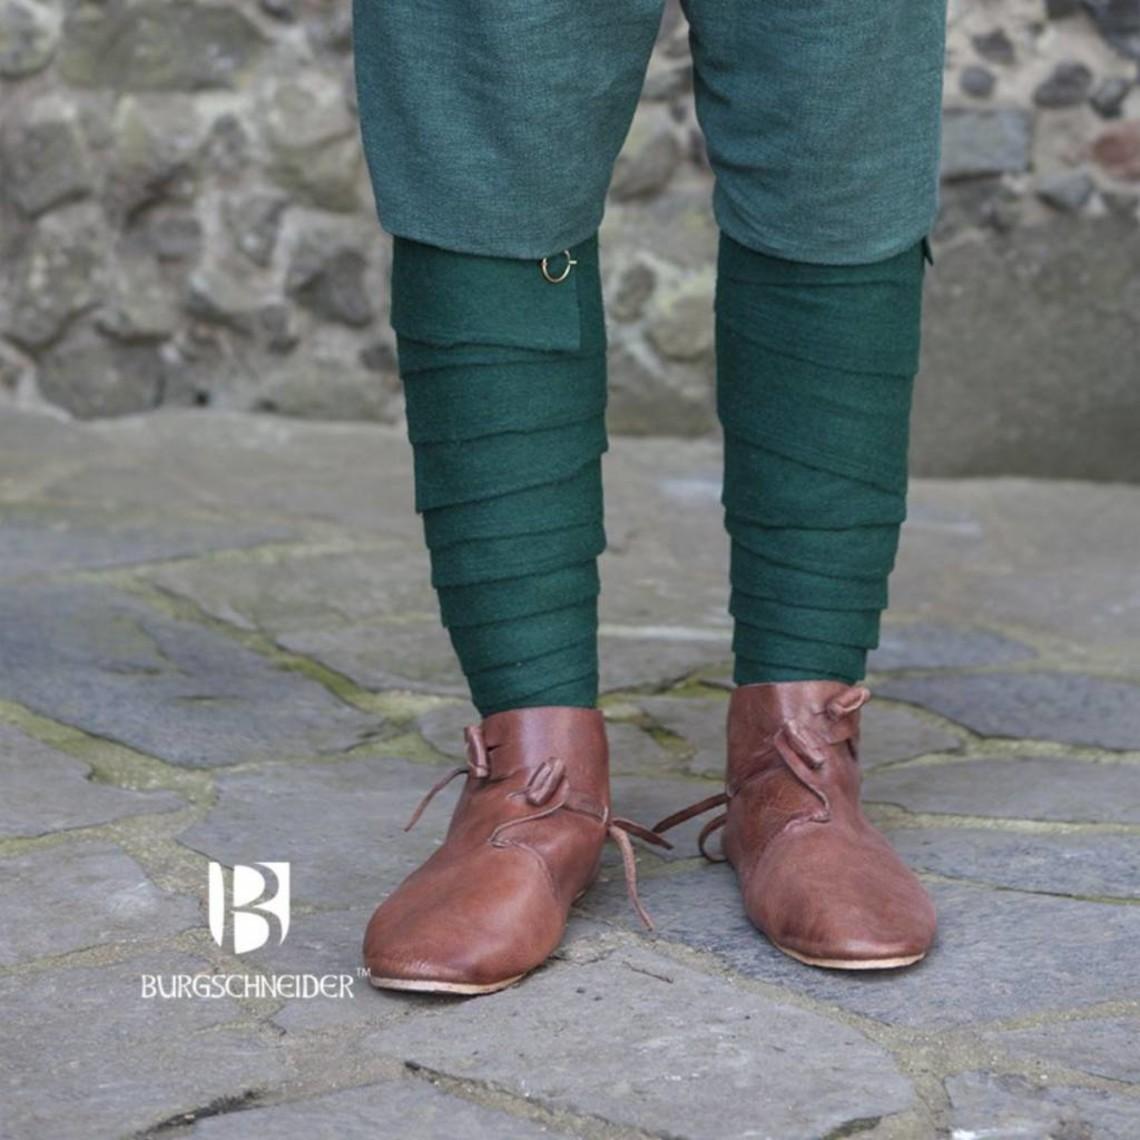 Burgschneider Leg Bende Aki, verde